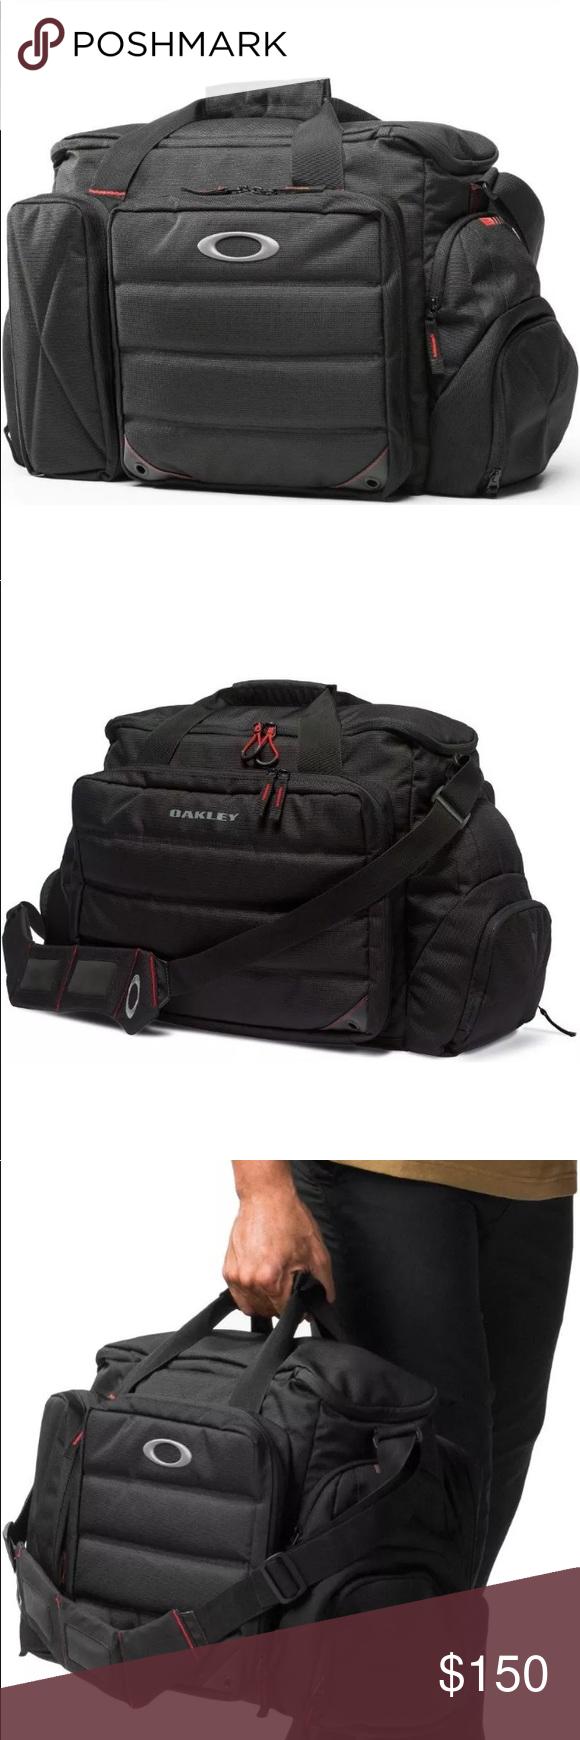 "6c561acc49 Oakley BREACH RANGE Bag Black Duffel Tactical Oakley BREACH RANGE Bag Black  Duffel Tactical Military Standard Issue 92801 001 19.5"" x 7.5"" x 13"" Oakley  Bags ..."